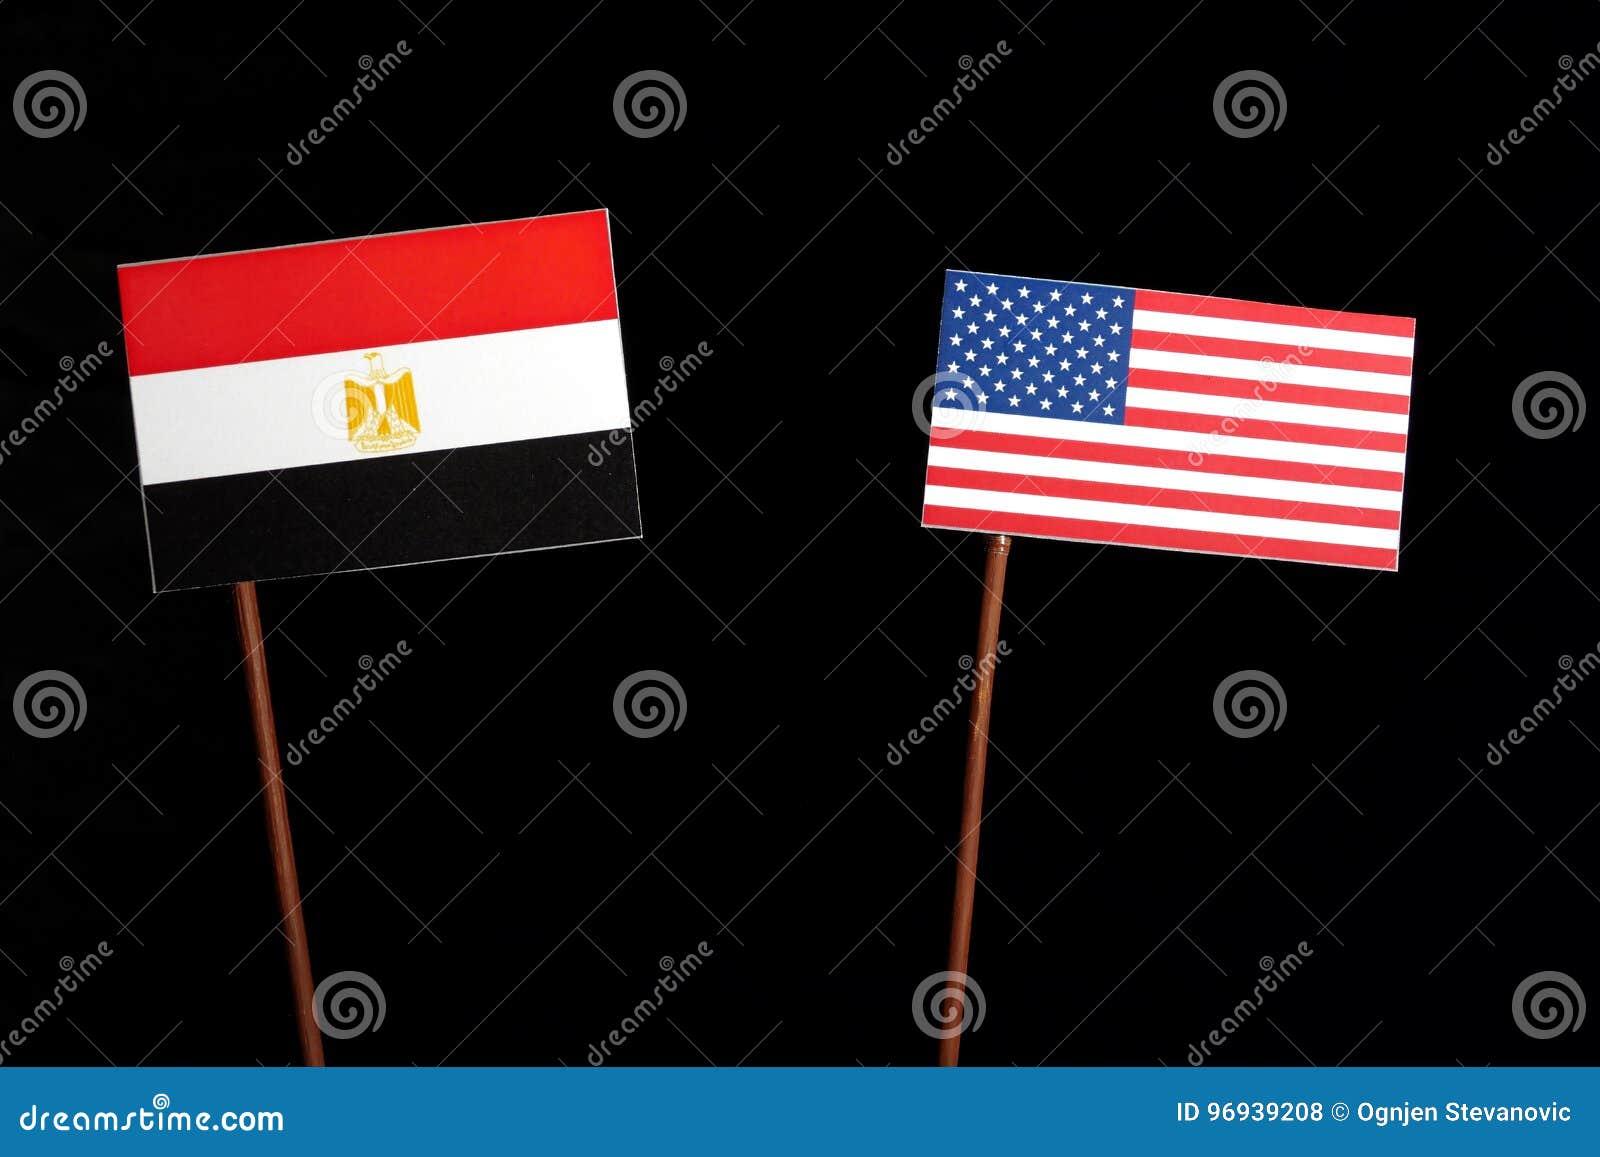 Egyptian flag with USA flag isolated on black